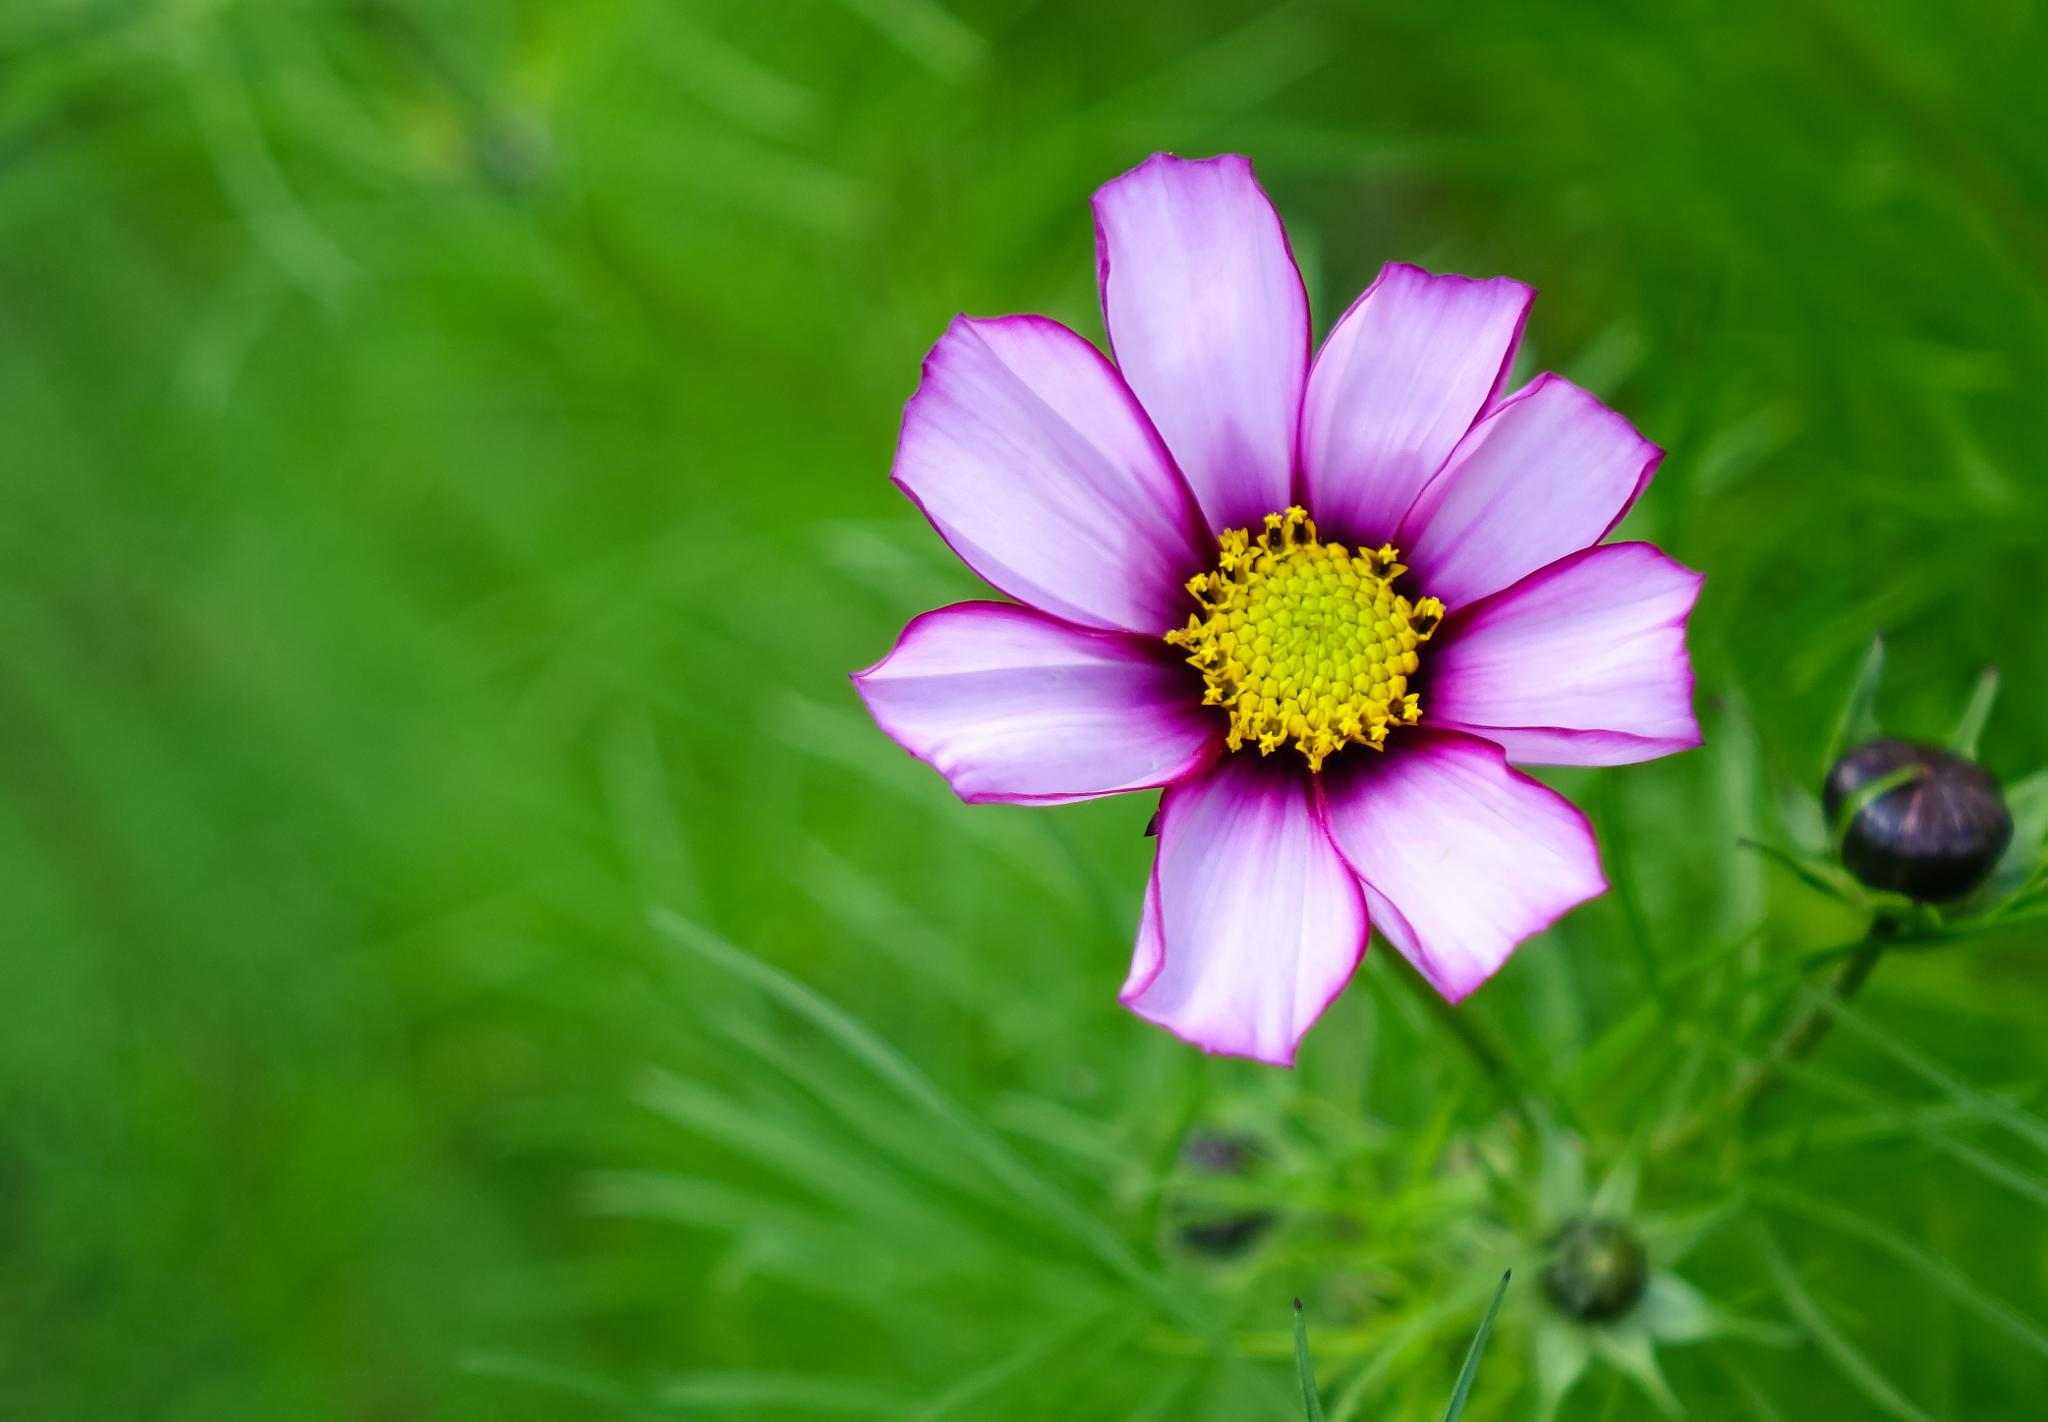 Flower by Peter Edwardo Vicente.